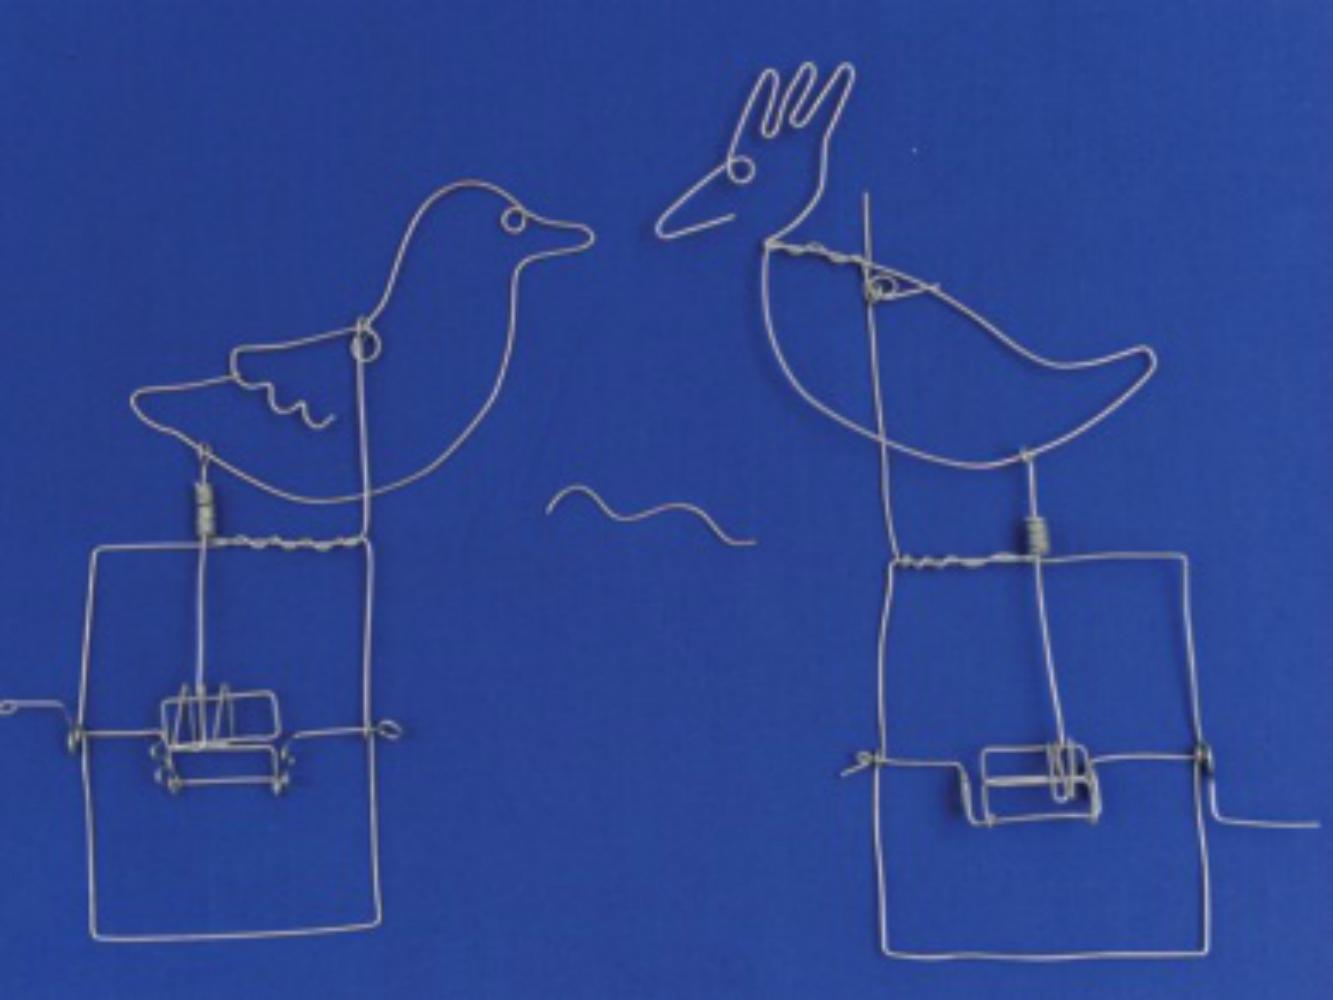 Bent-Wire Crank Toy